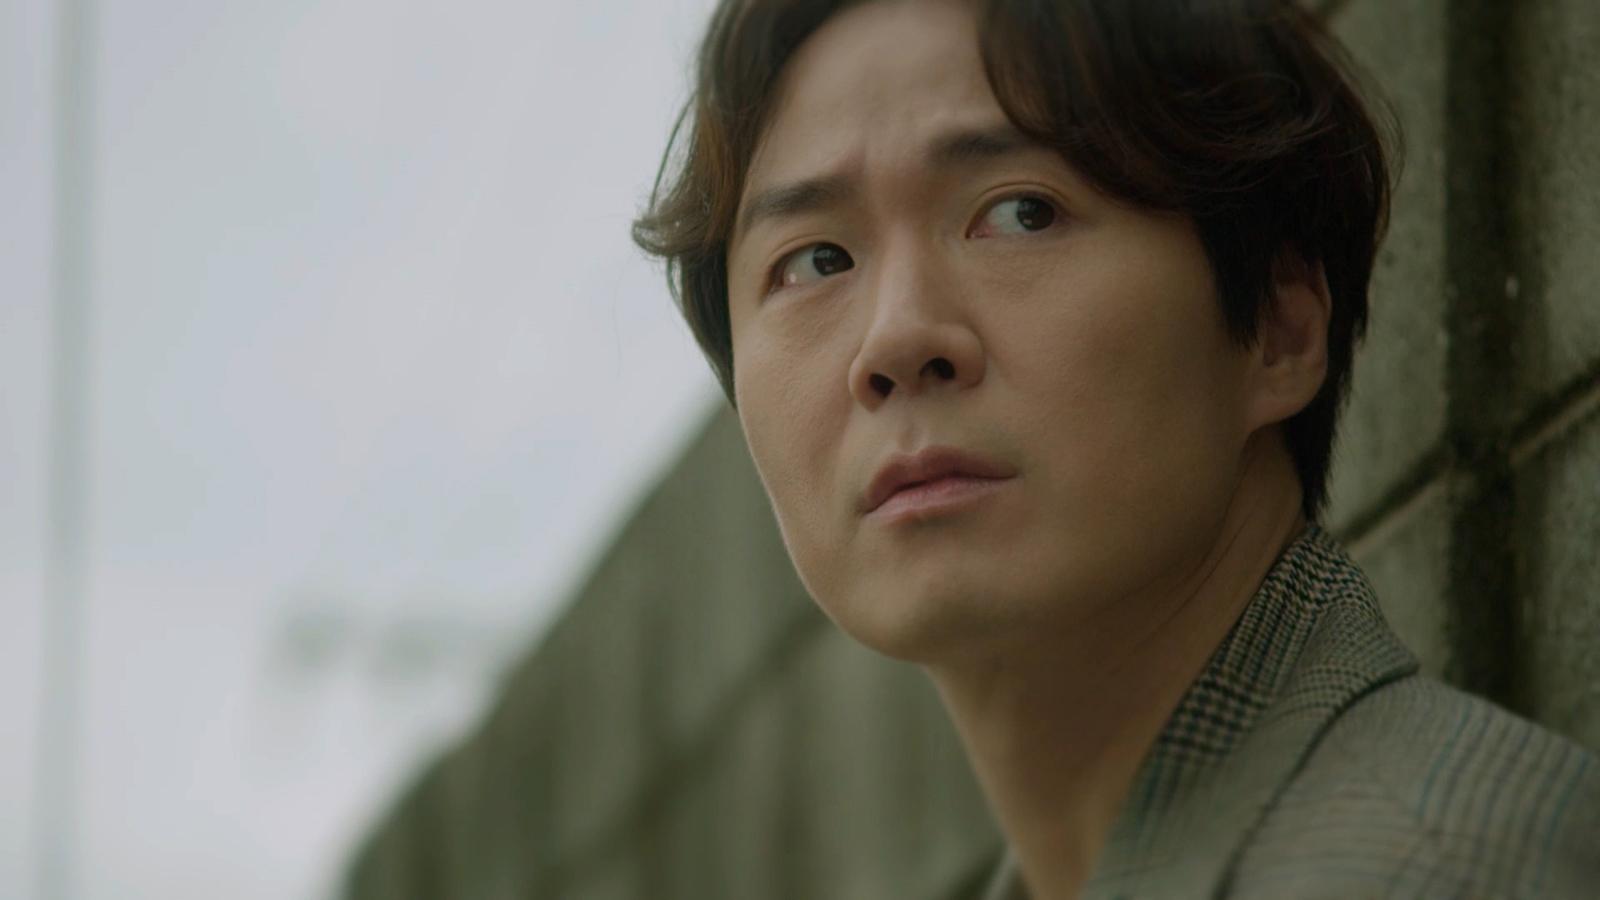 Trailer 2: My Healing Love